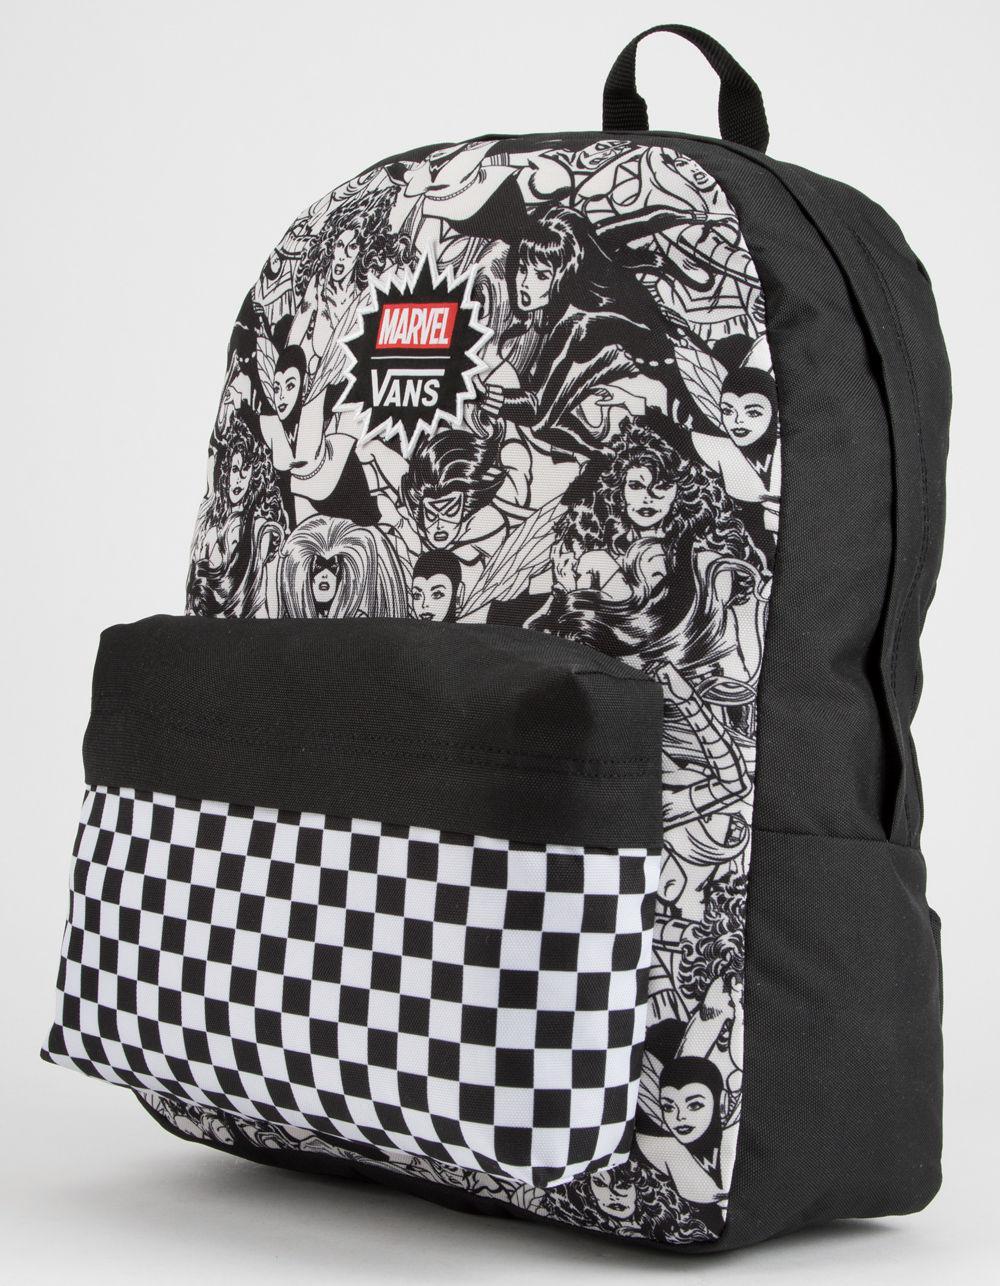 Lyst - Vans X Marvel Marvel Women Realm Backpack in Black d0b701c5a31b6